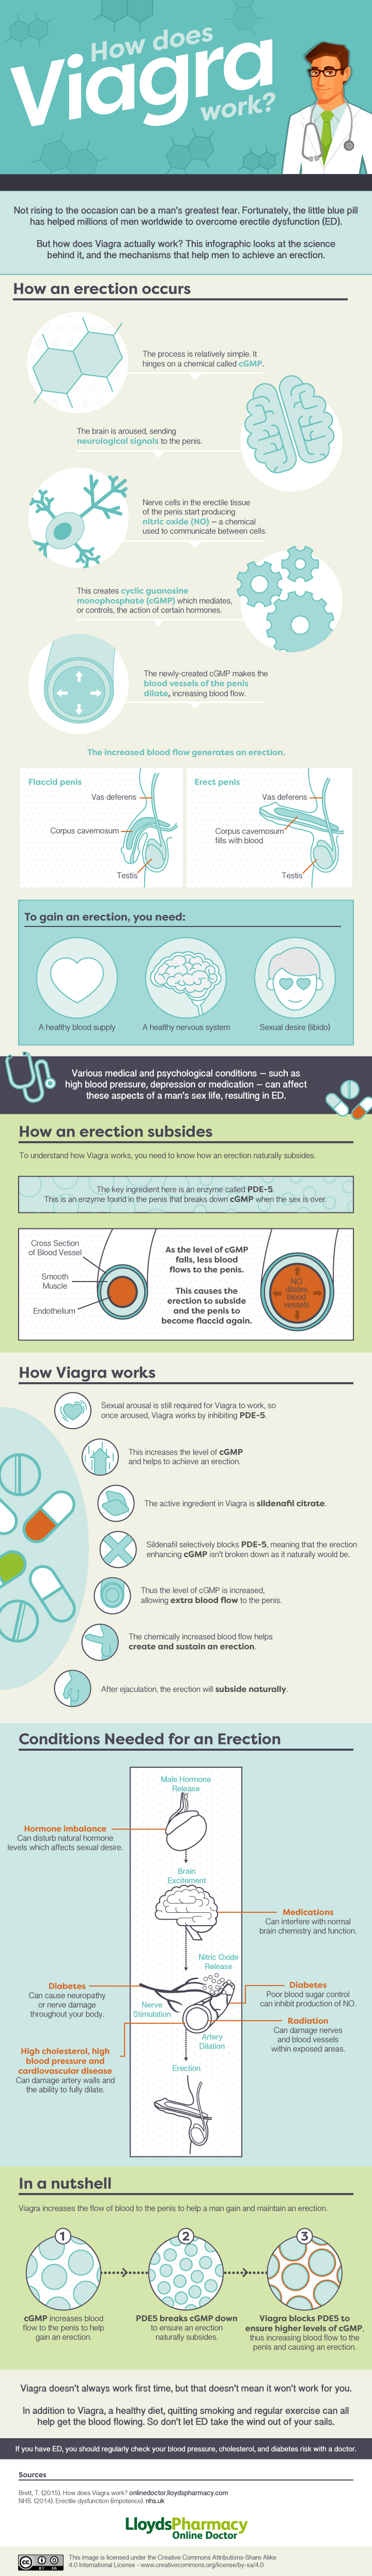 Generic viagra how does it work